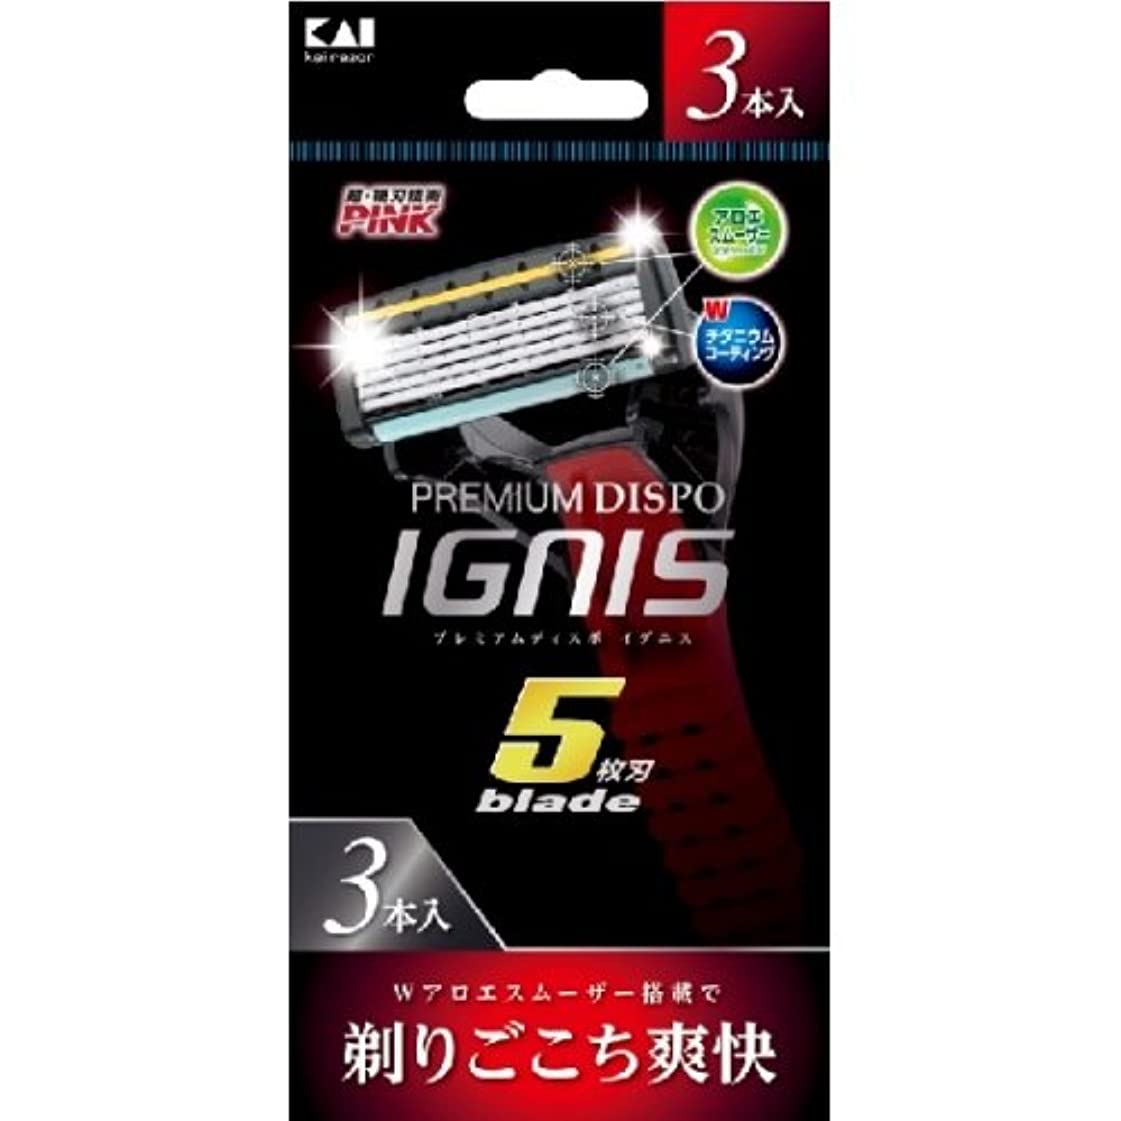 PREMIUM DISPO IGNIS(プレミアム ディスポ イグニス)5枚刃 使い捨てカミソリ 3本入